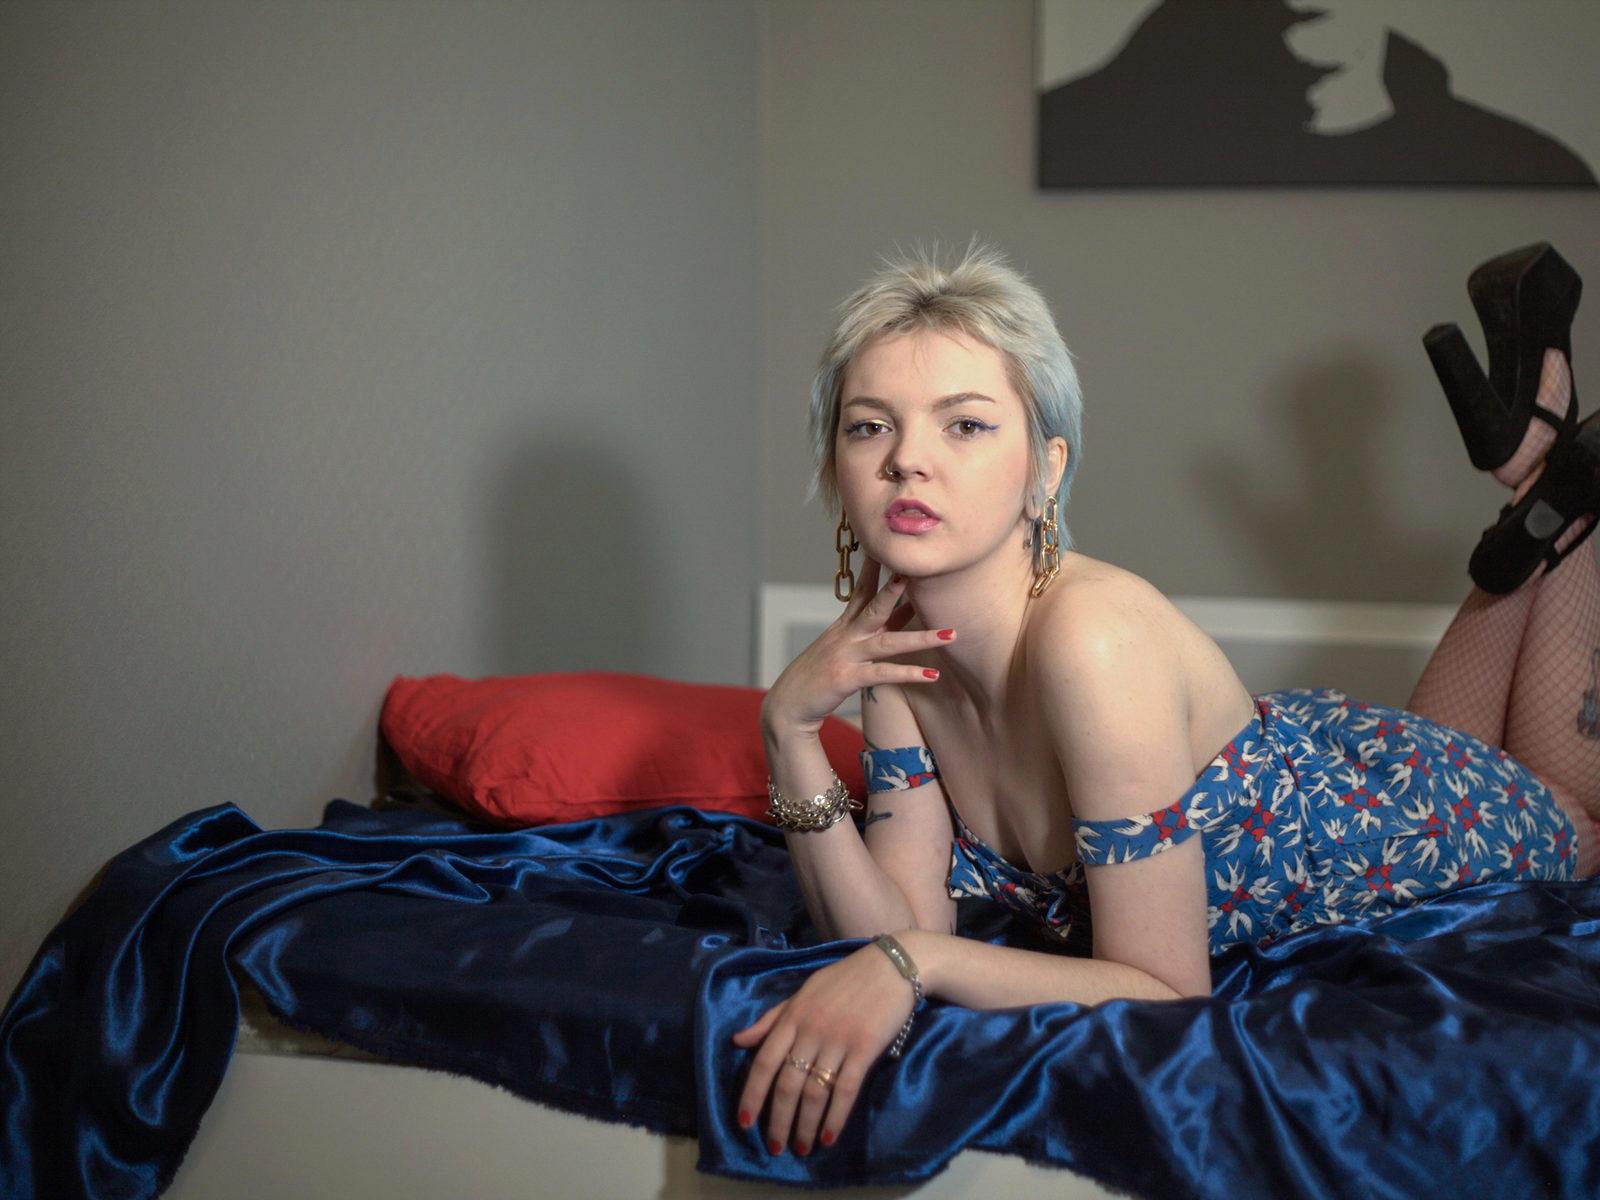 Webcam model Alice Ohfairy from WebPowerCam